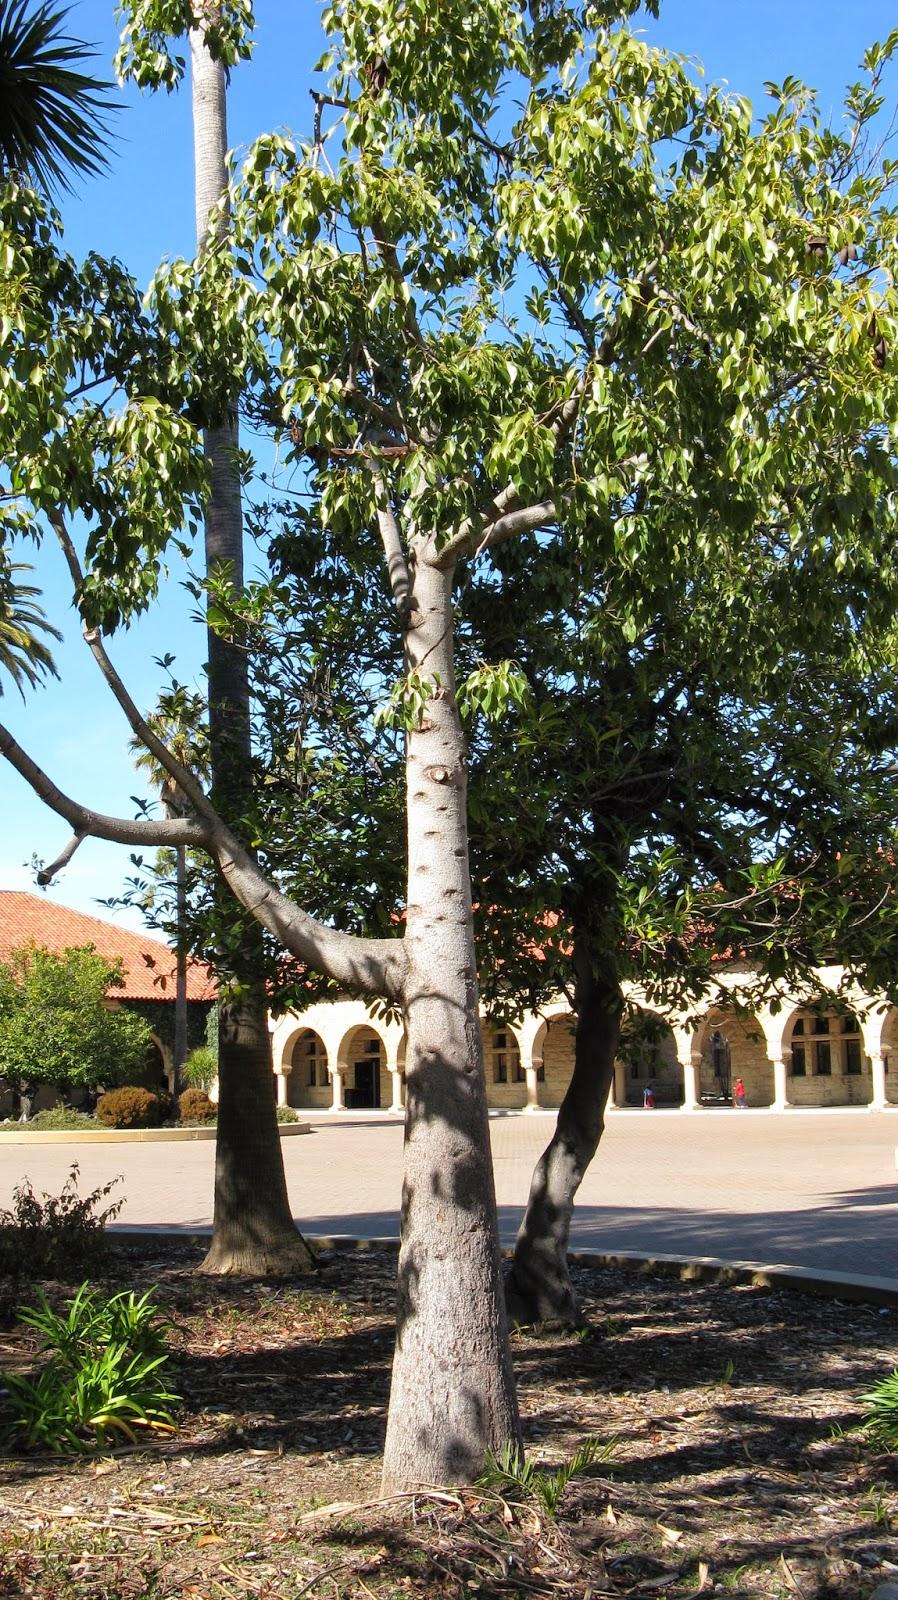 Trees Of Santa Cruz County: Brachychiton Populneus